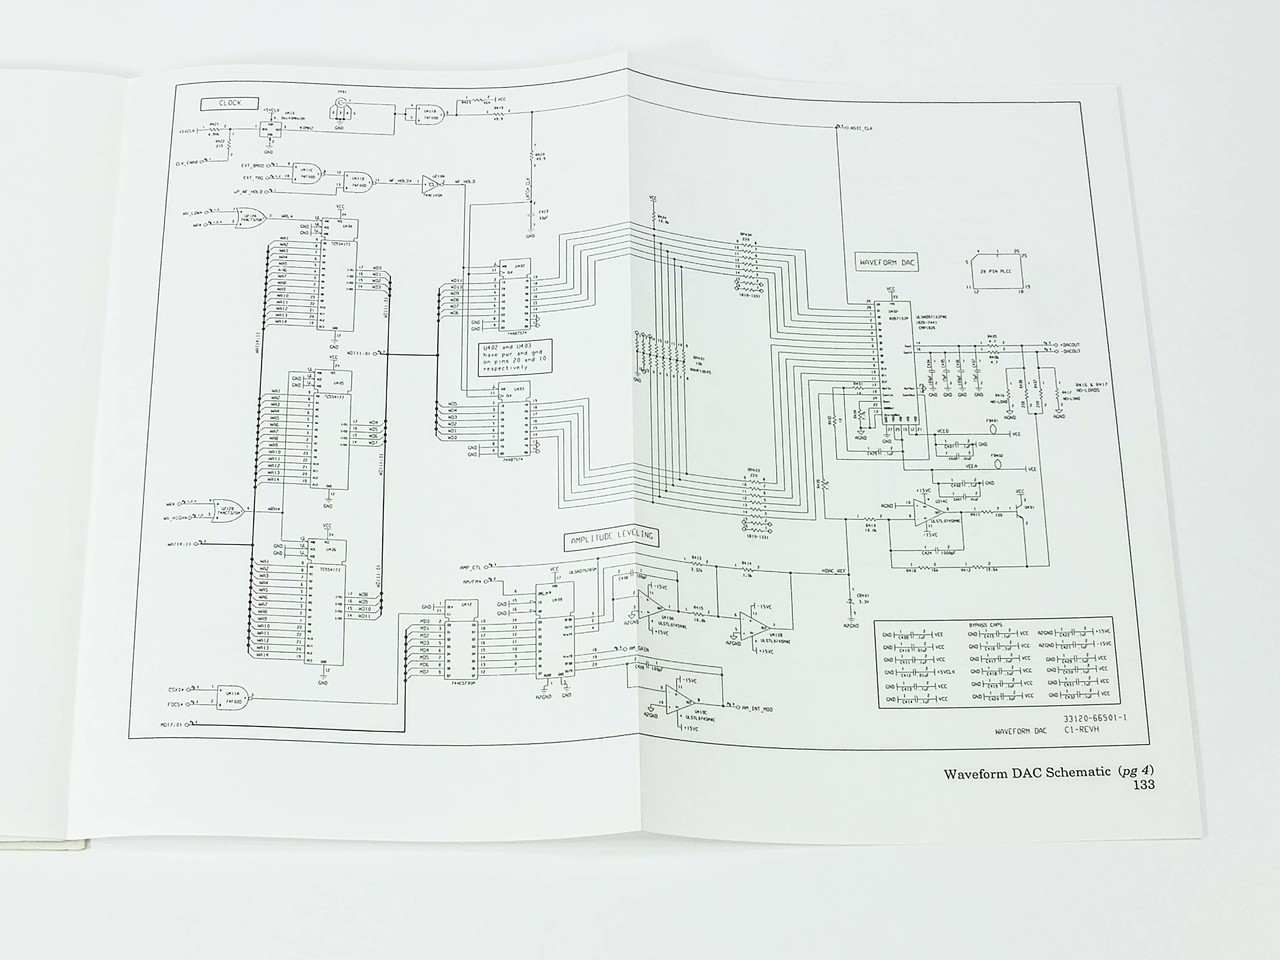 HP 33120A Function Generator/Arbitrary Waveform Generator